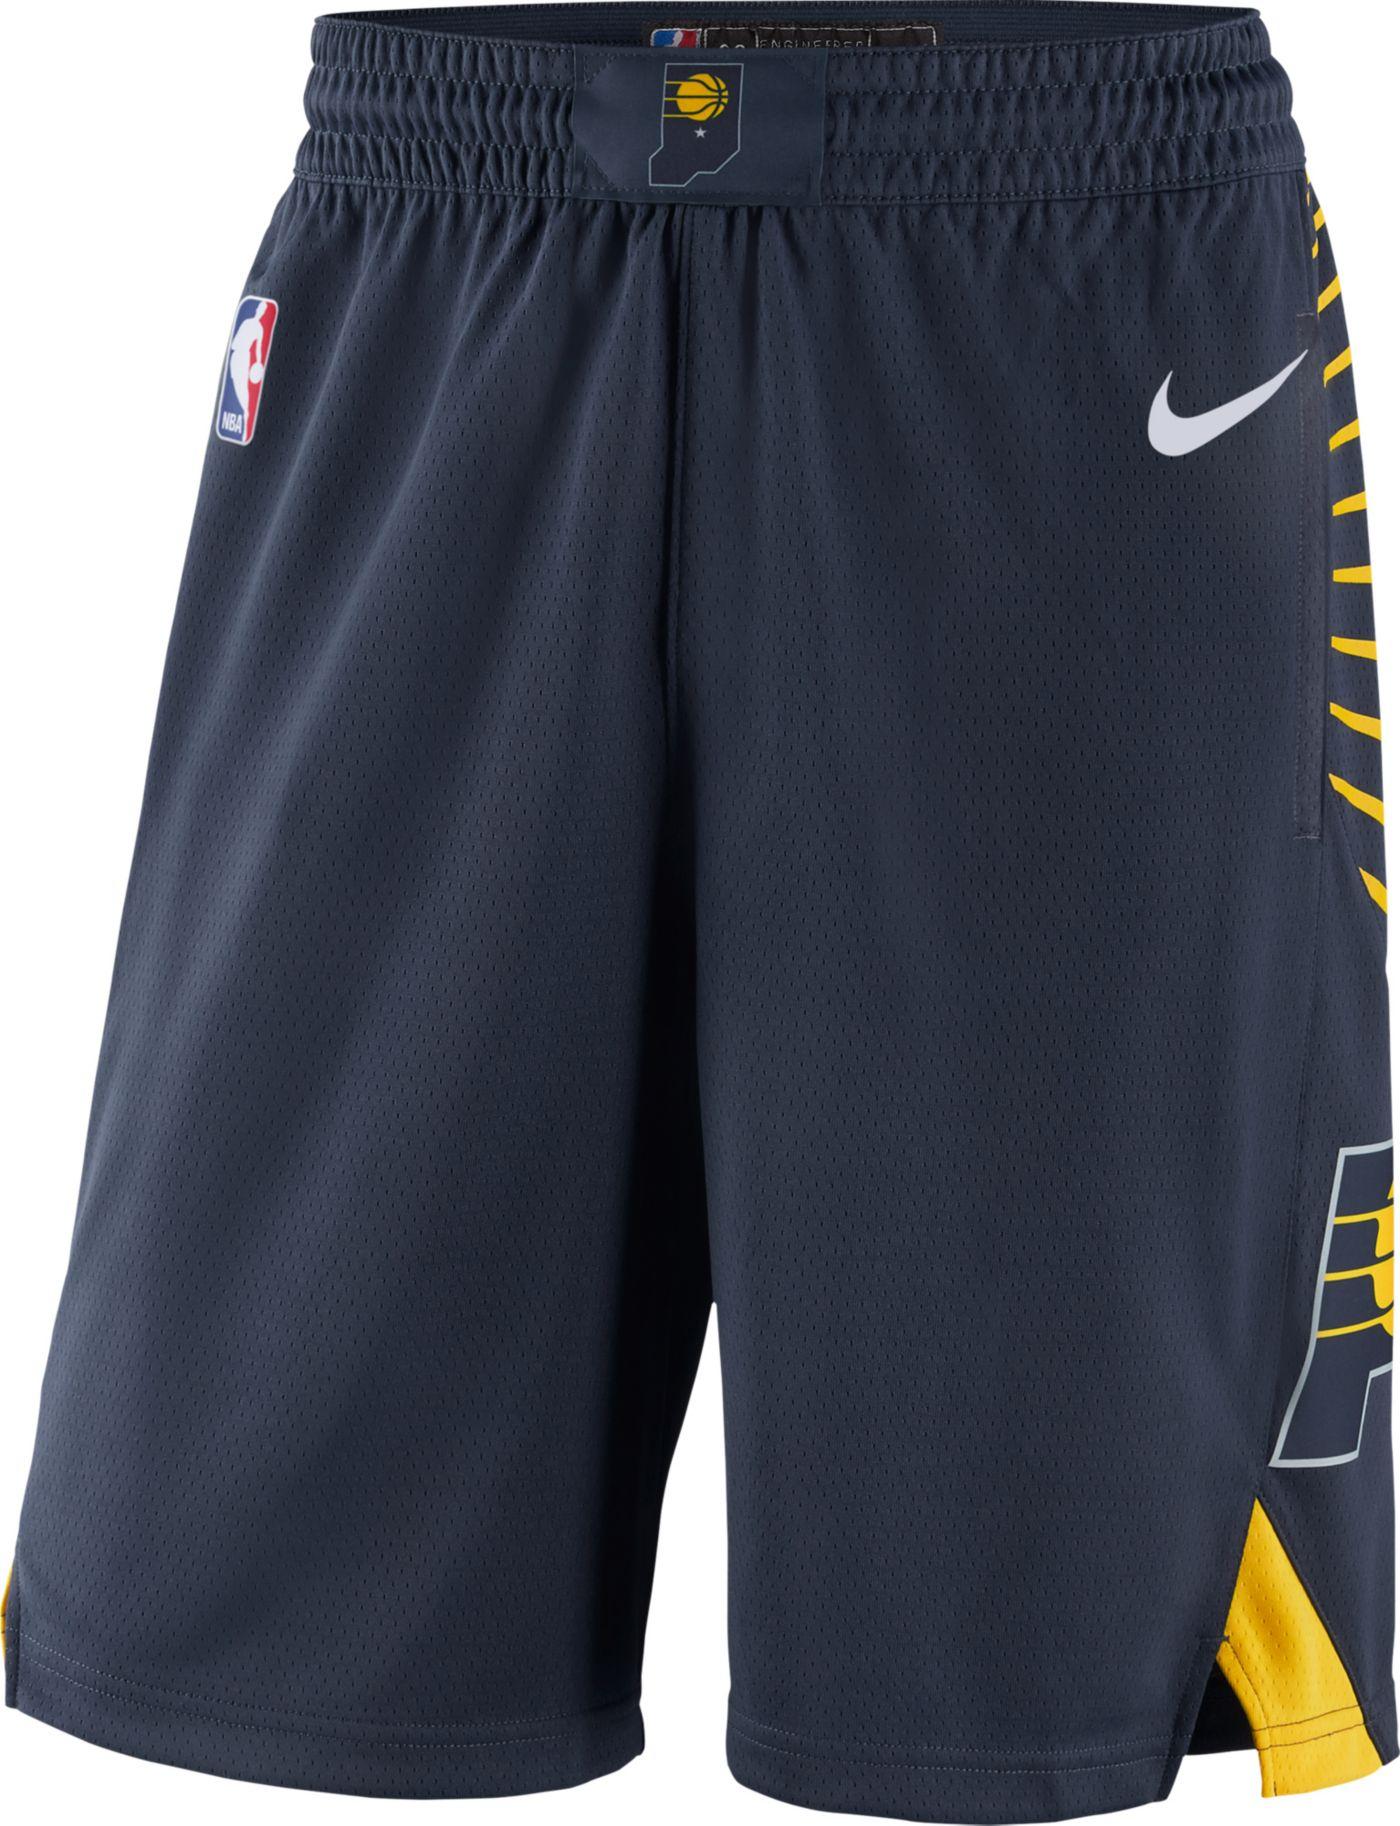 Nike Men's Indiana Pacers Dri-FIT Swingman Shorts